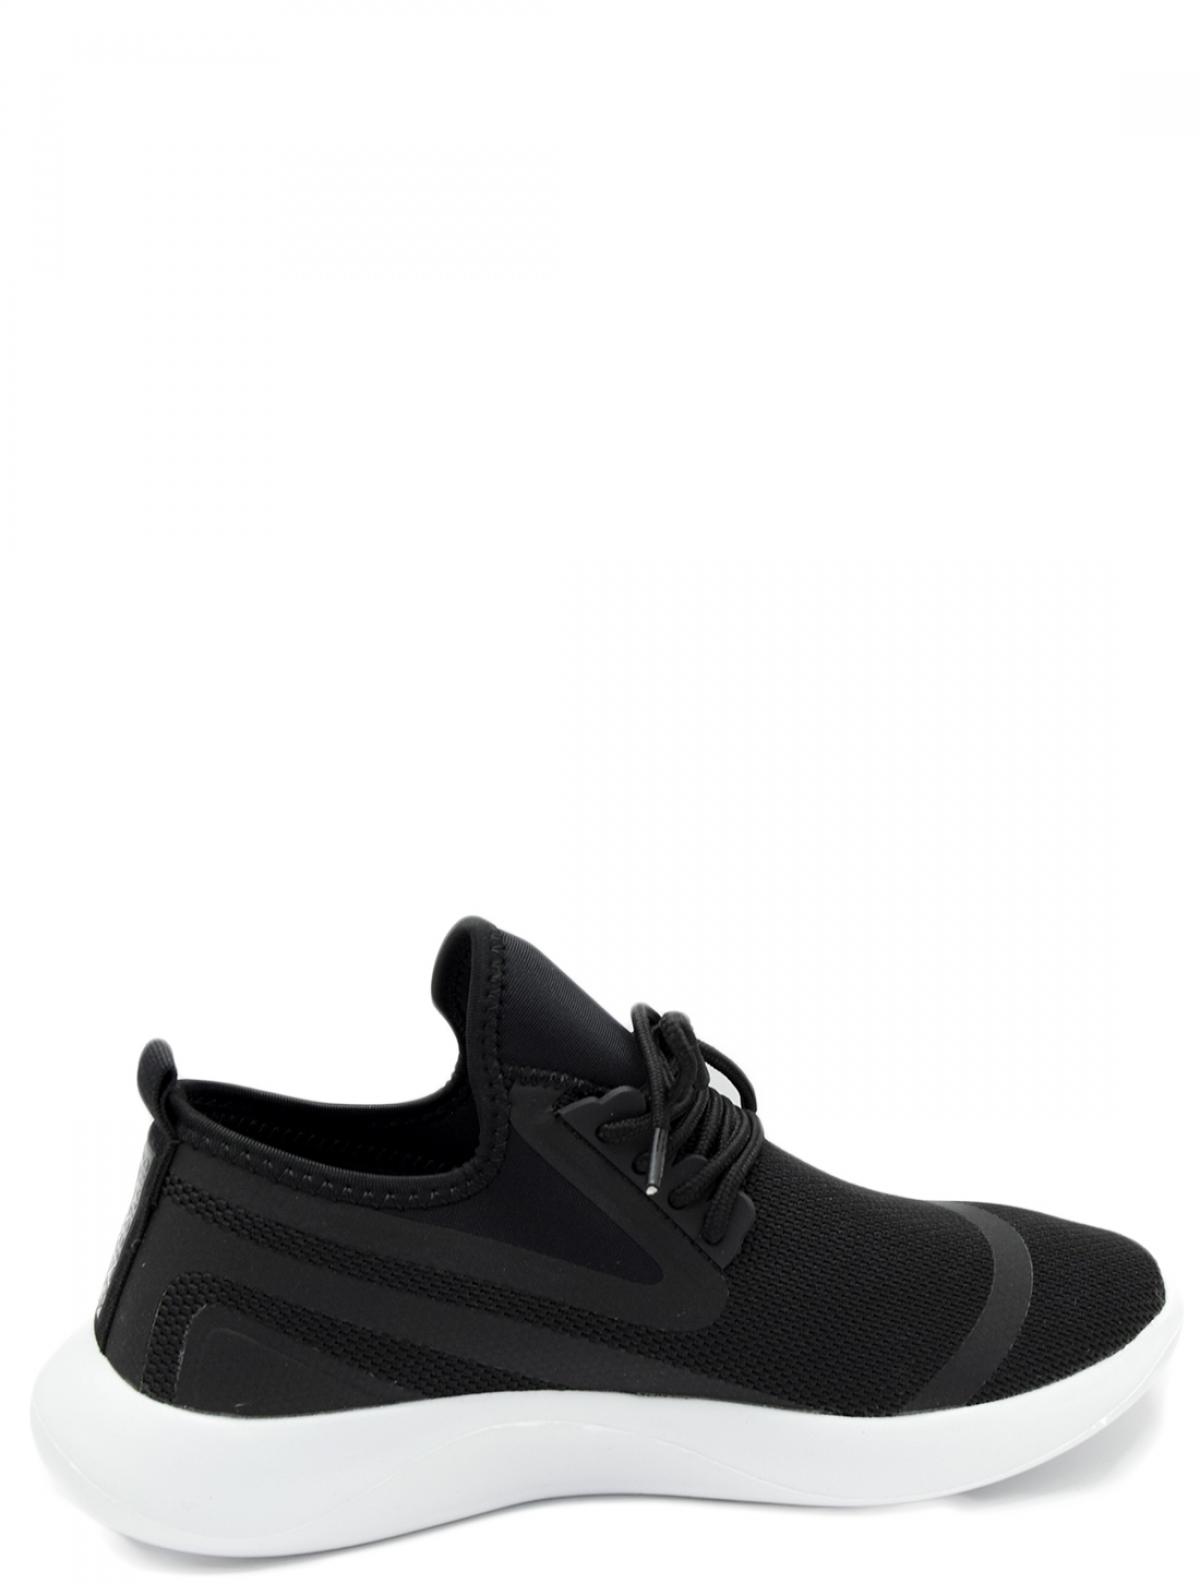 CROSBY 497028/01-03 мужские кроссовки